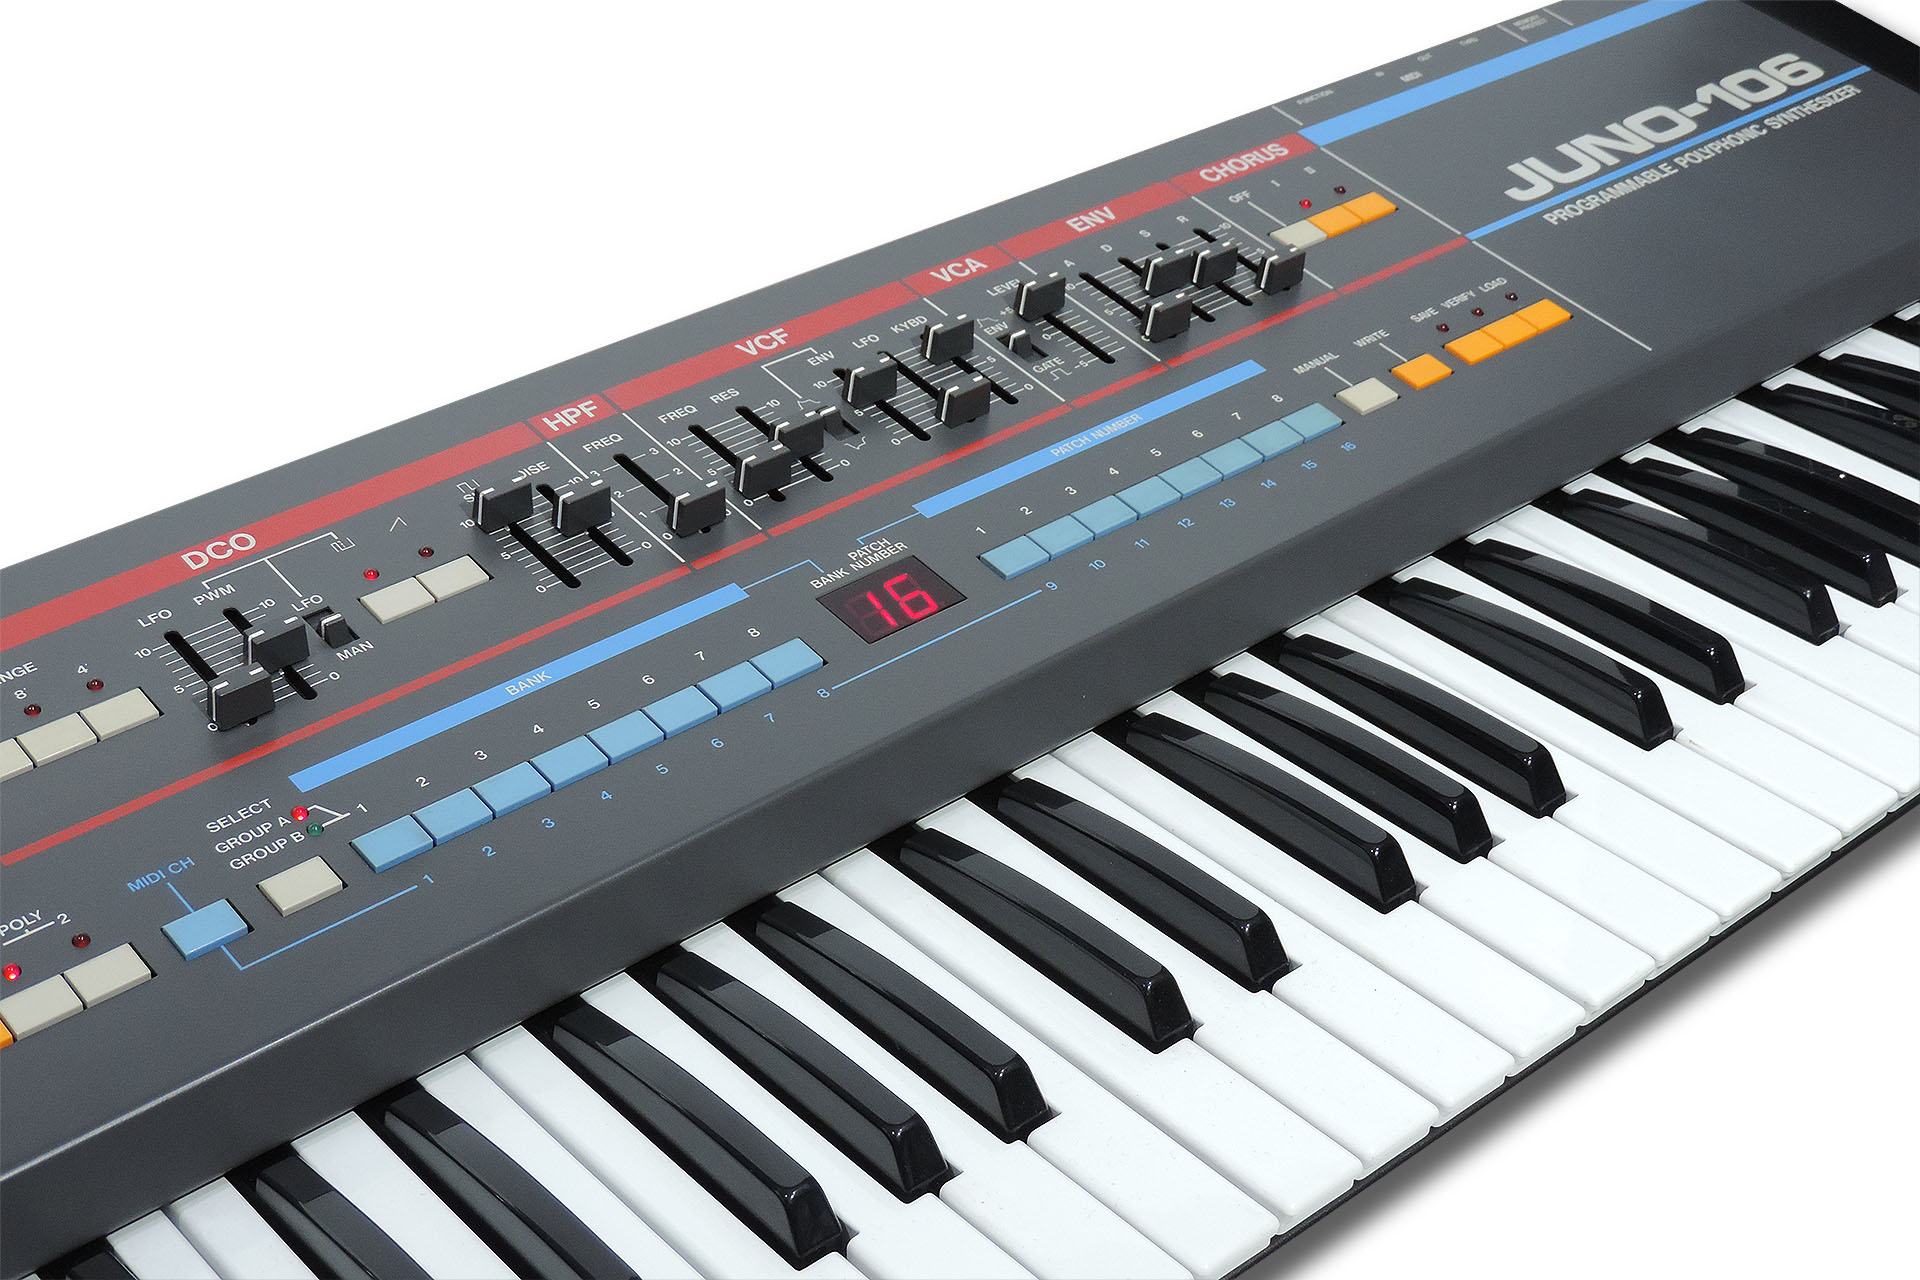 My Roland Juno-106